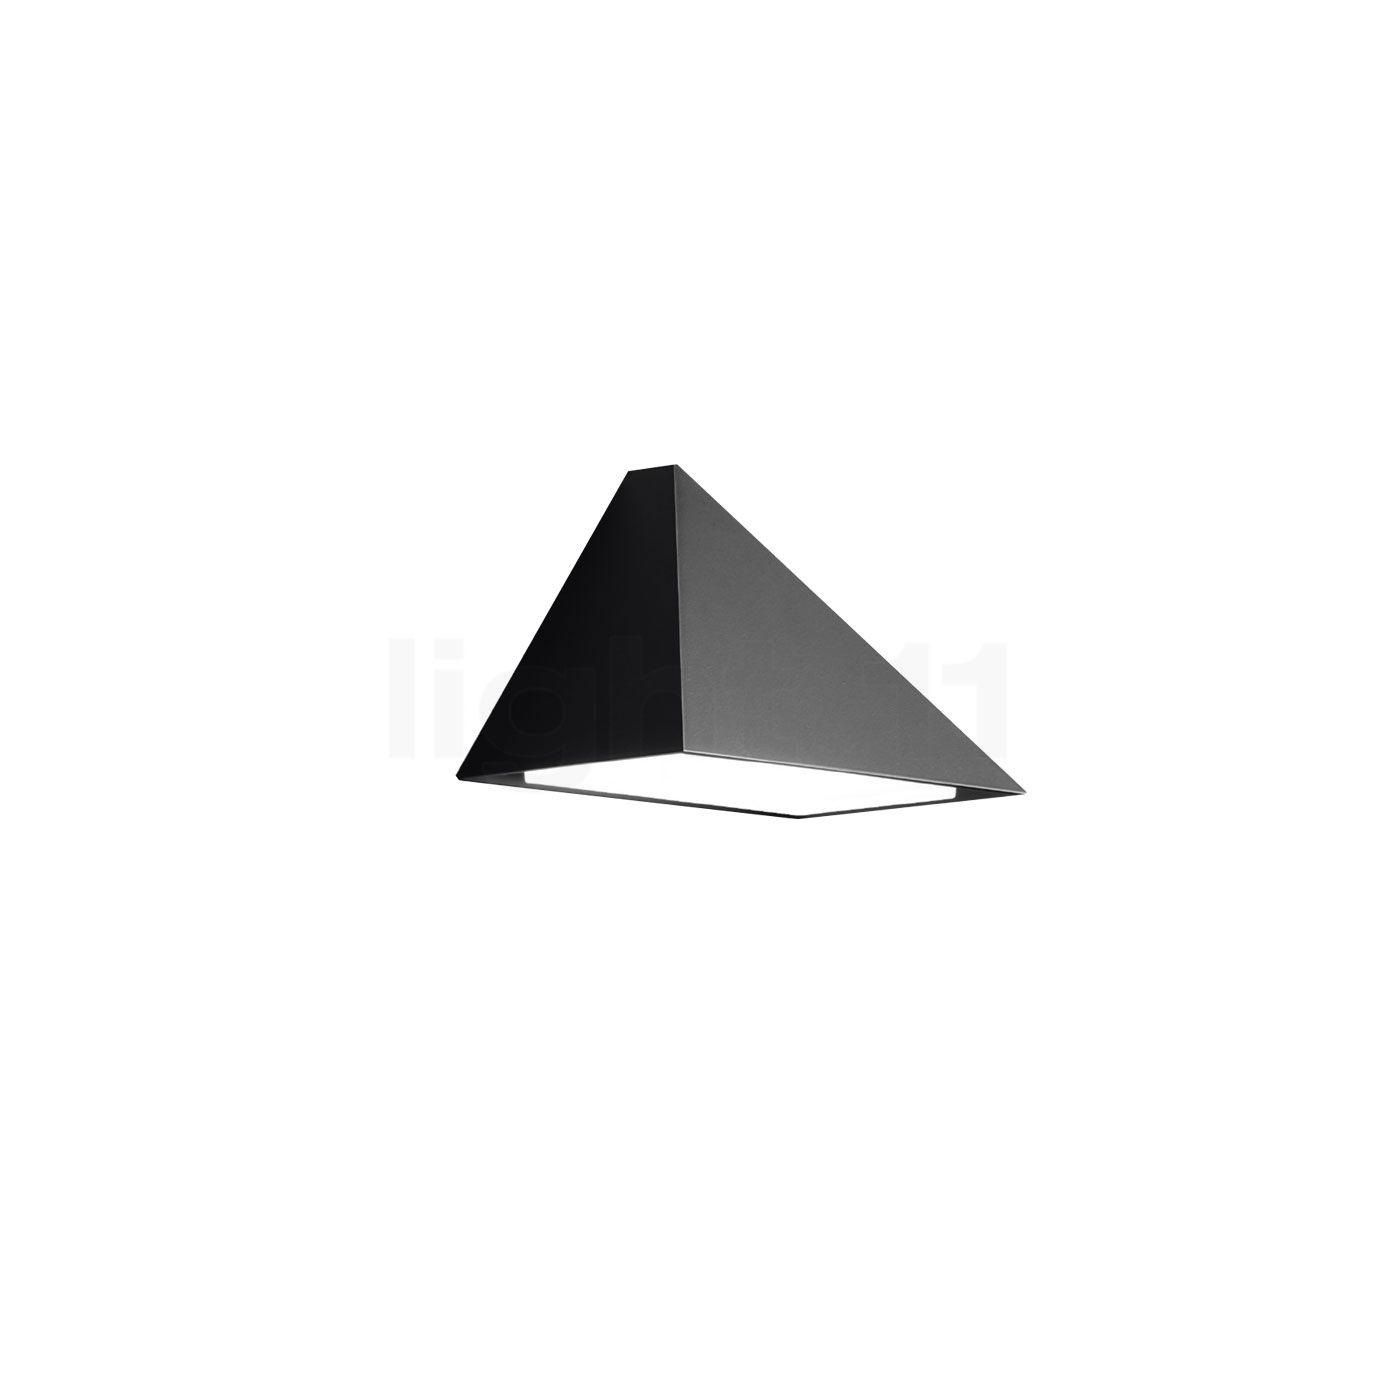 bega 22431 wandleuchte fluo kaufen bei. Black Bedroom Furniture Sets. Home Design Ideas